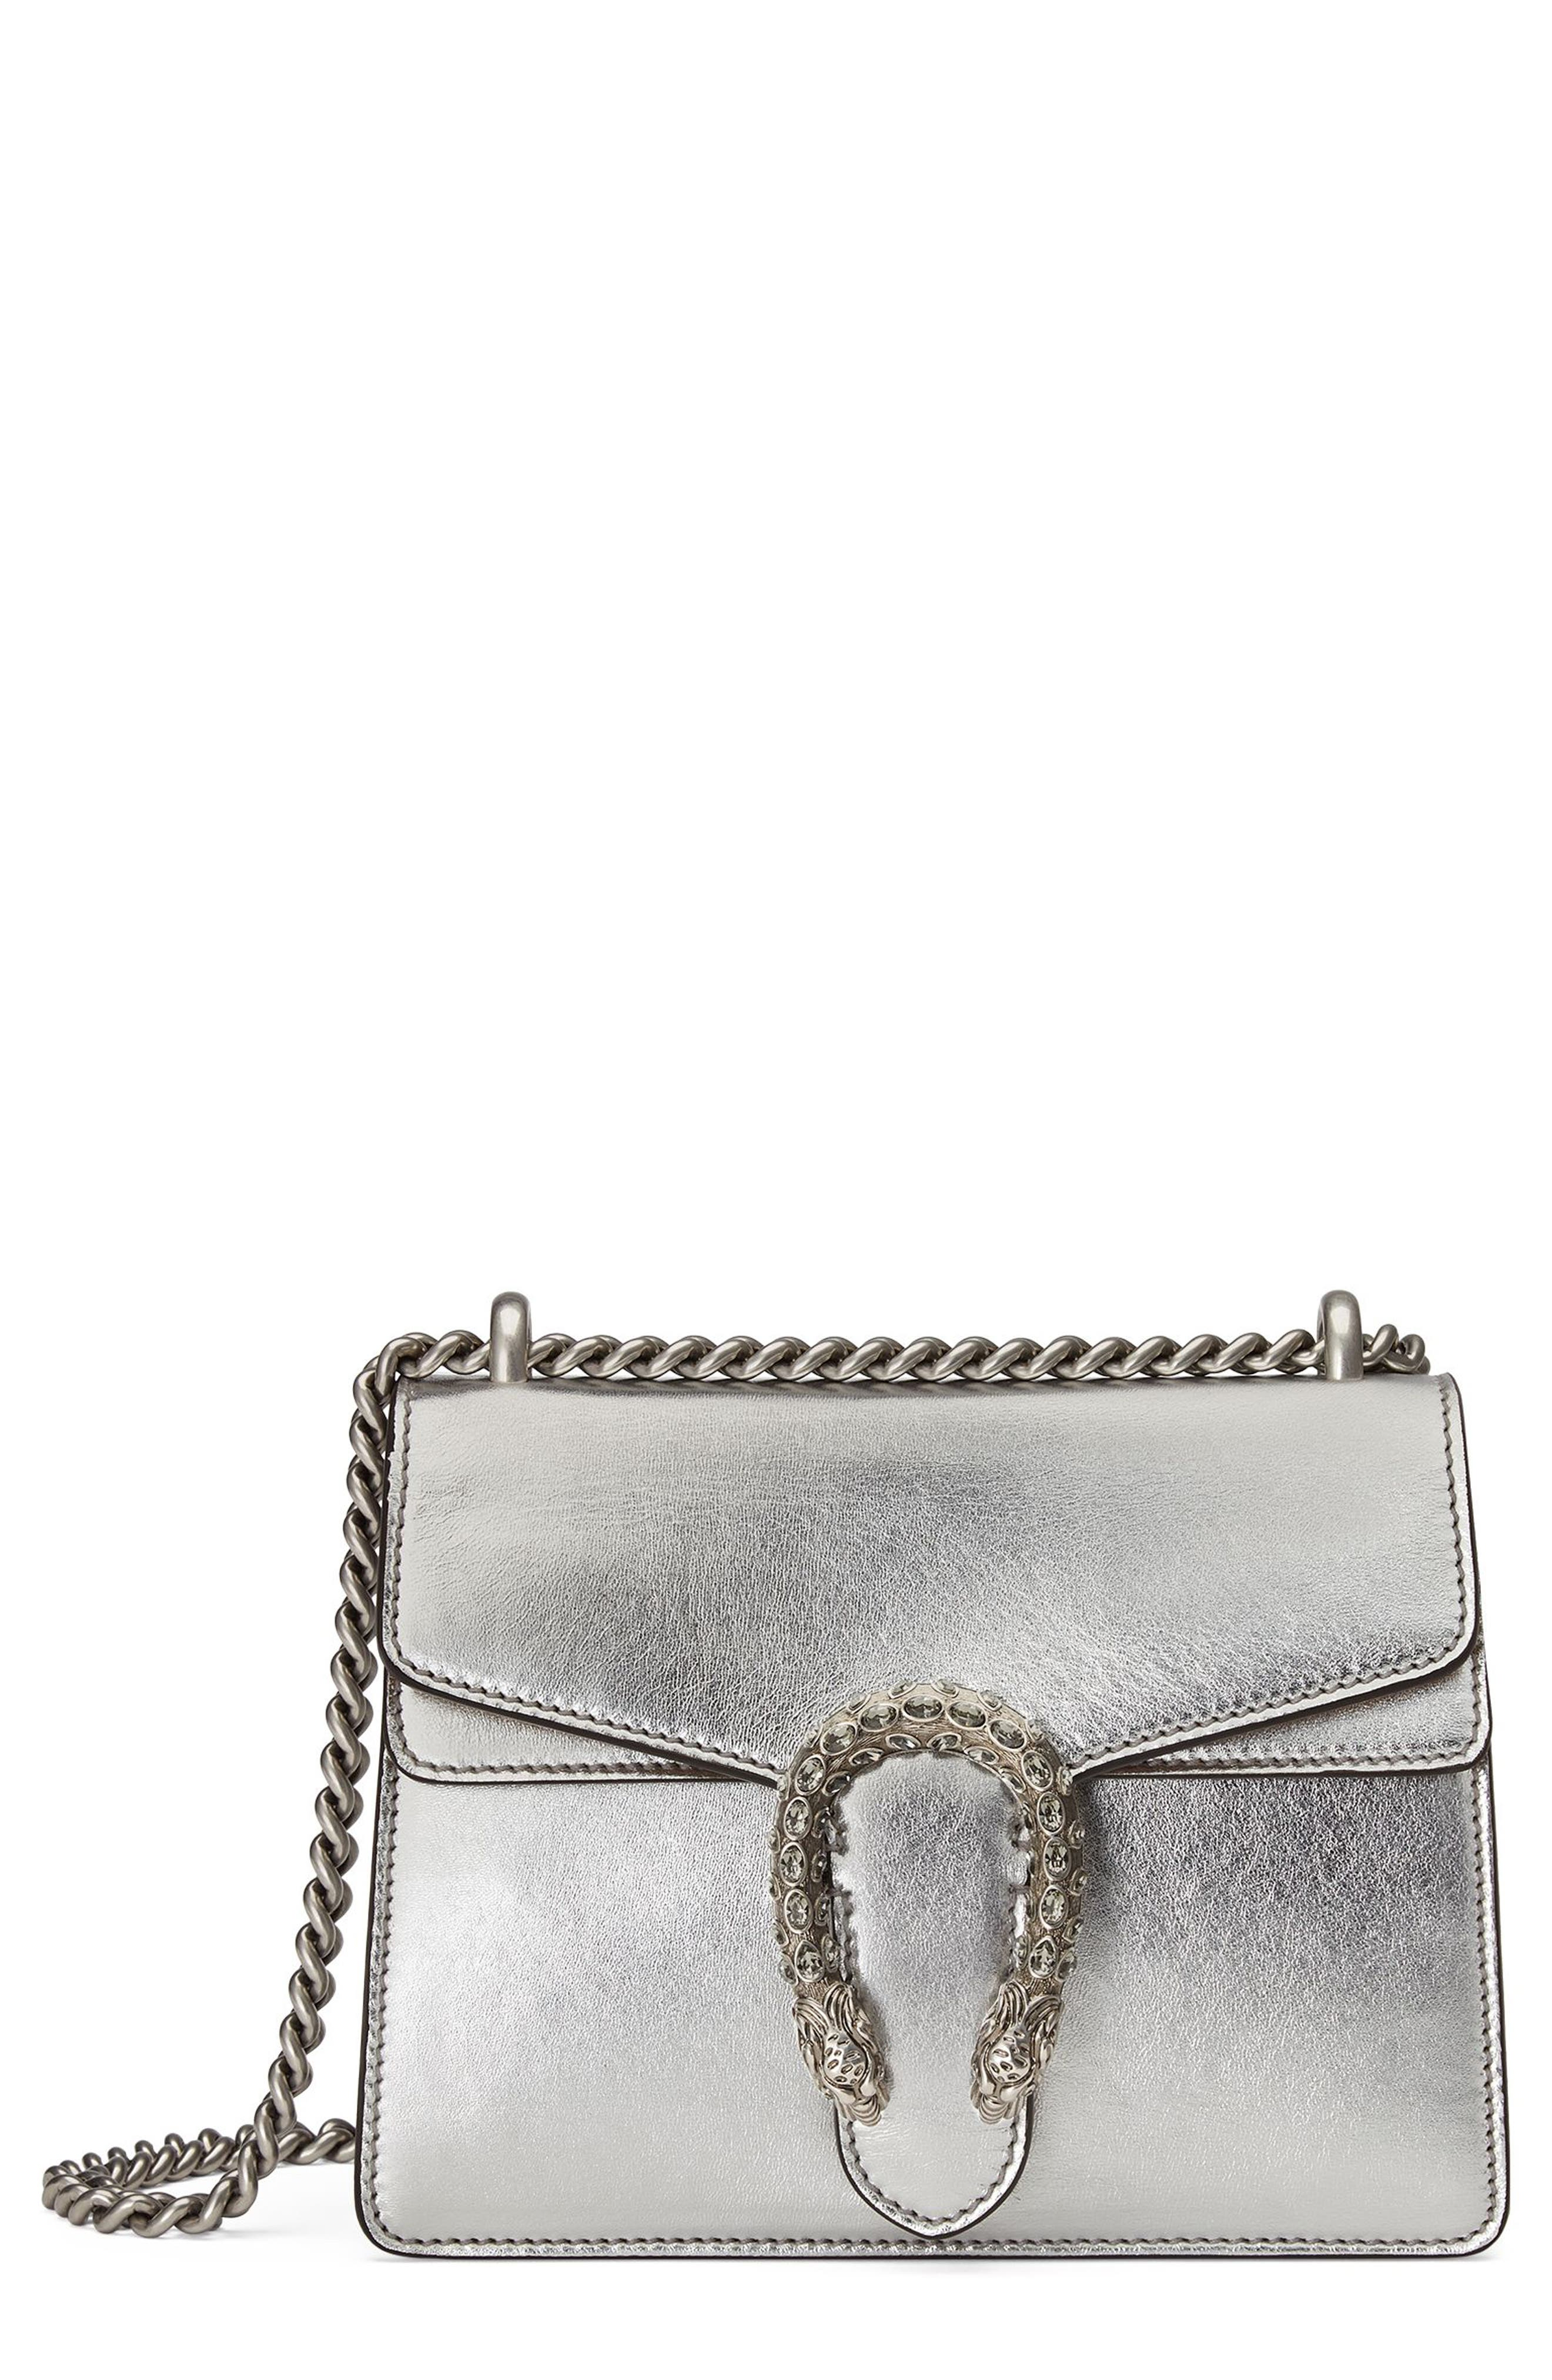 Alternate Image 1 Selected - Gucci Mini Dionysus Metallic Leather Shoulder Bag